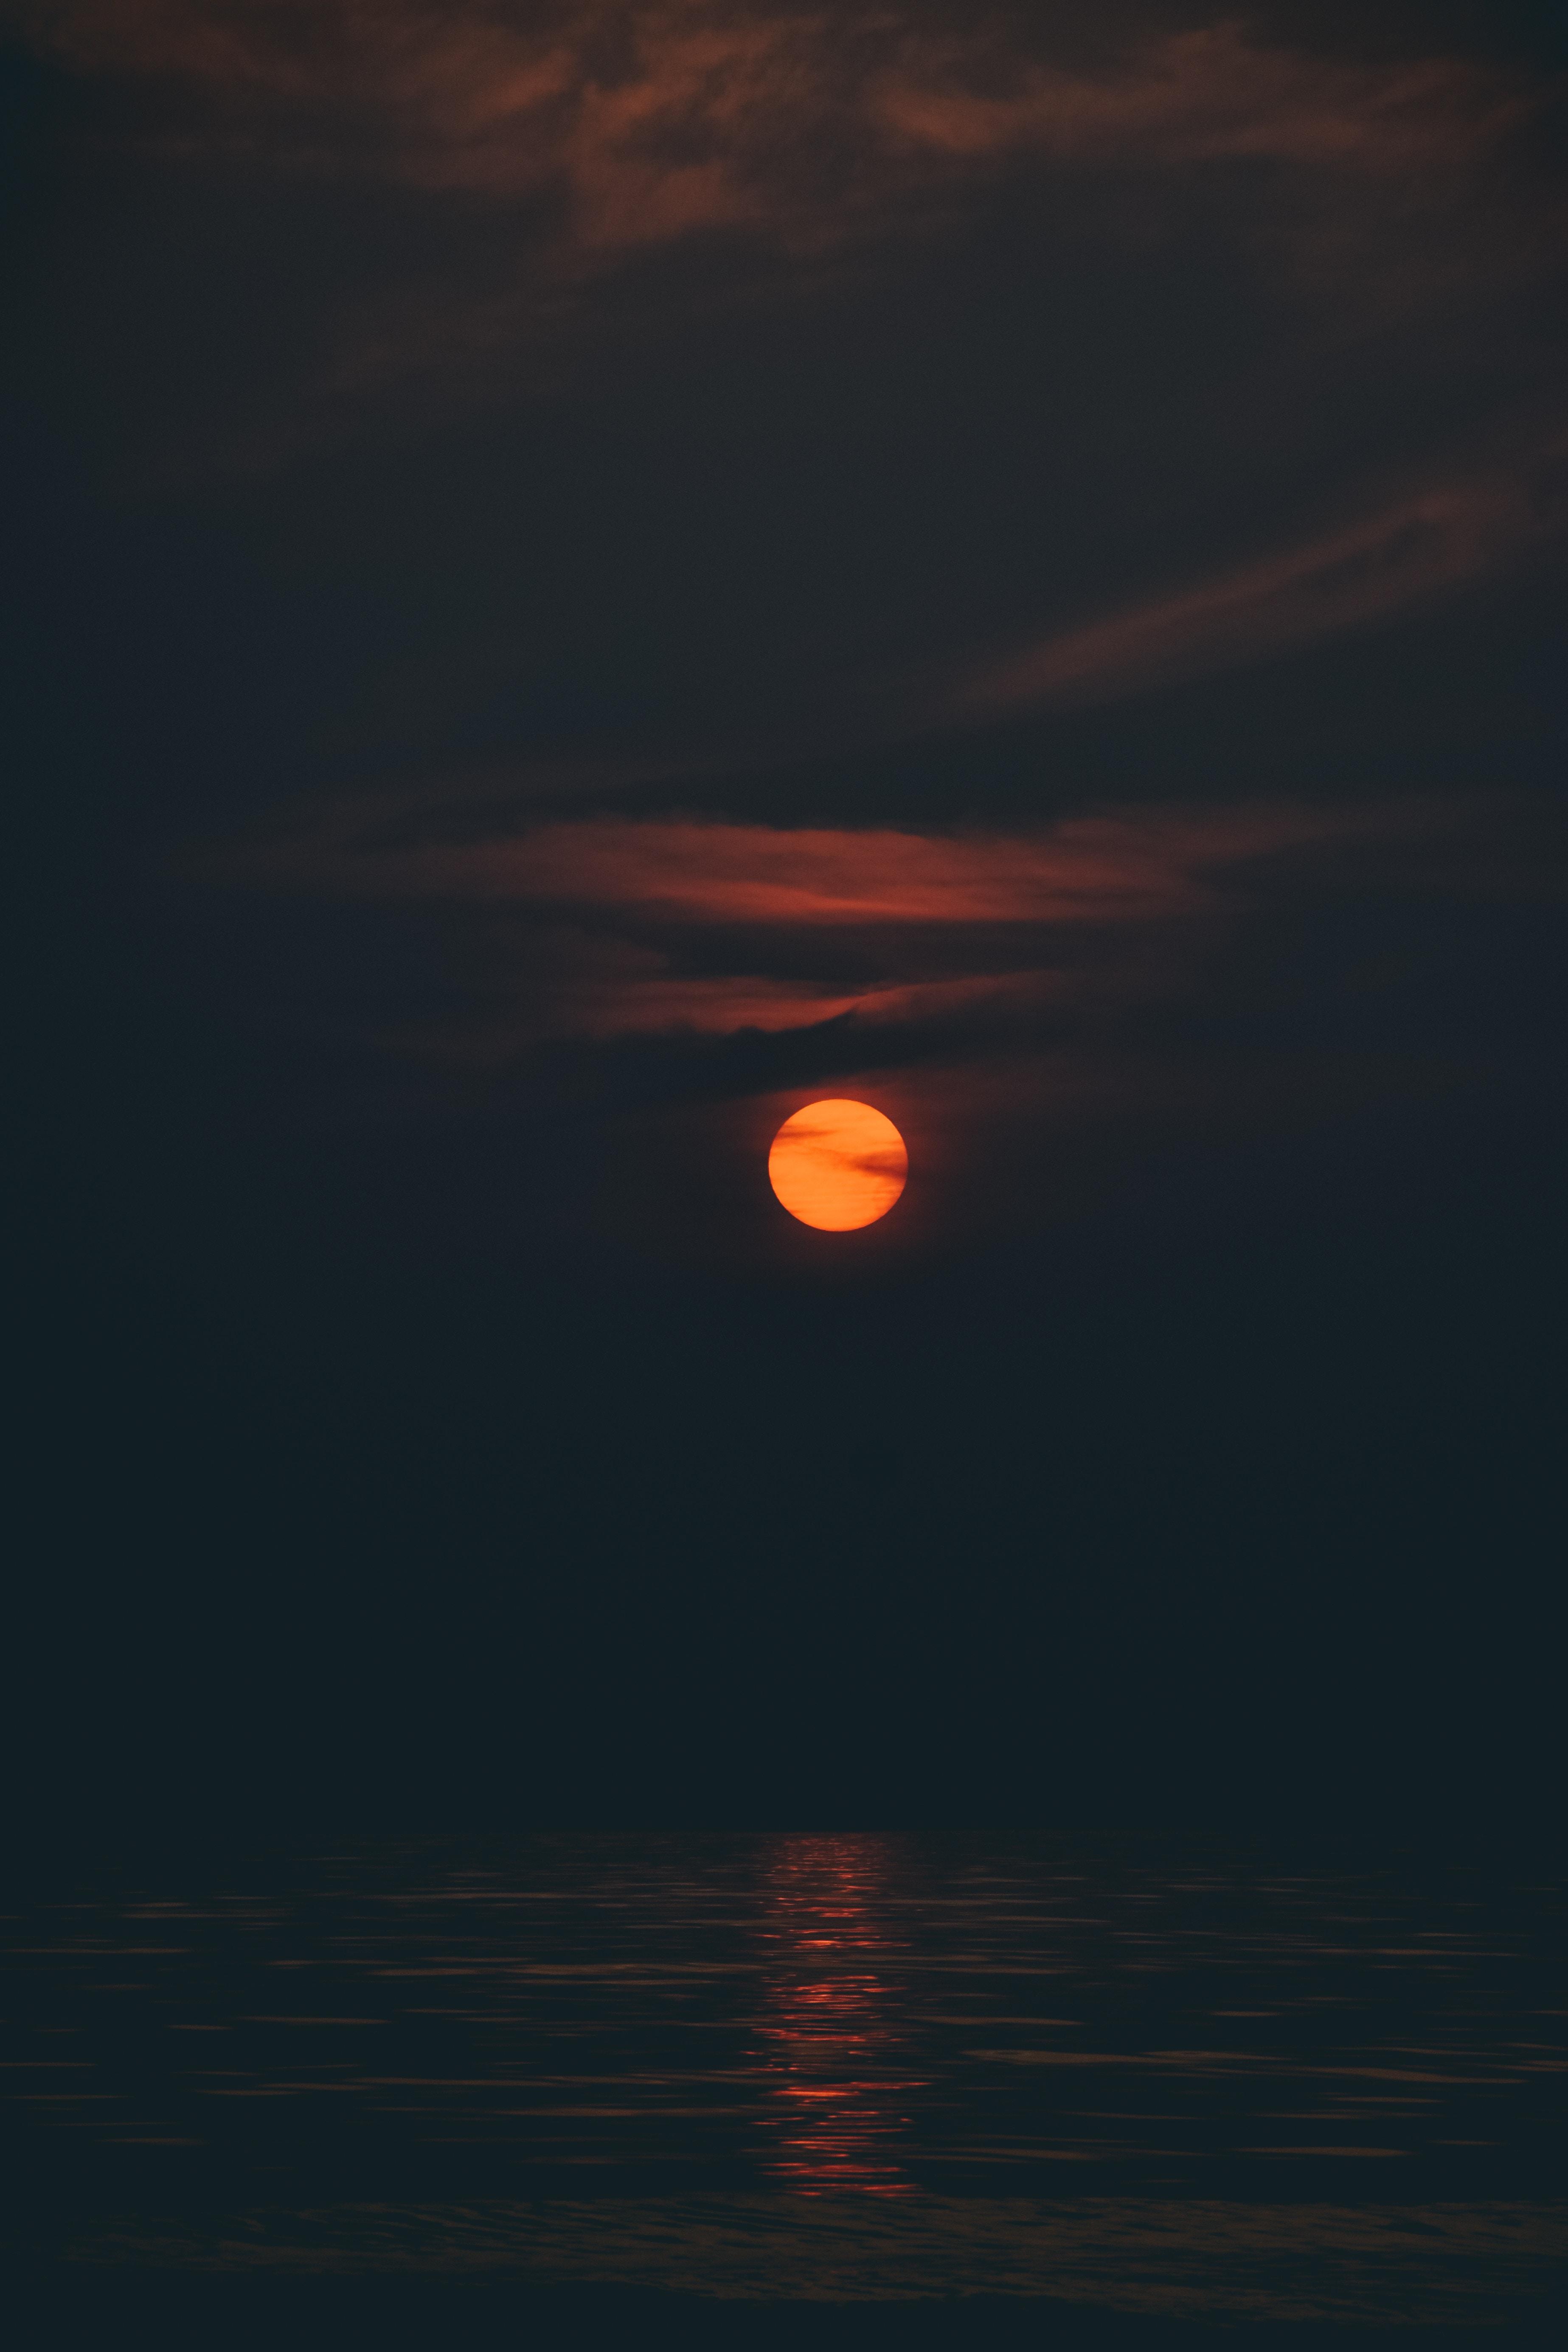 89992 Screensavers and Wallpapers Dark for phone. Download Dark, Ocean, Moon, Sunset, Night, Sky, Mumbai pictures for free